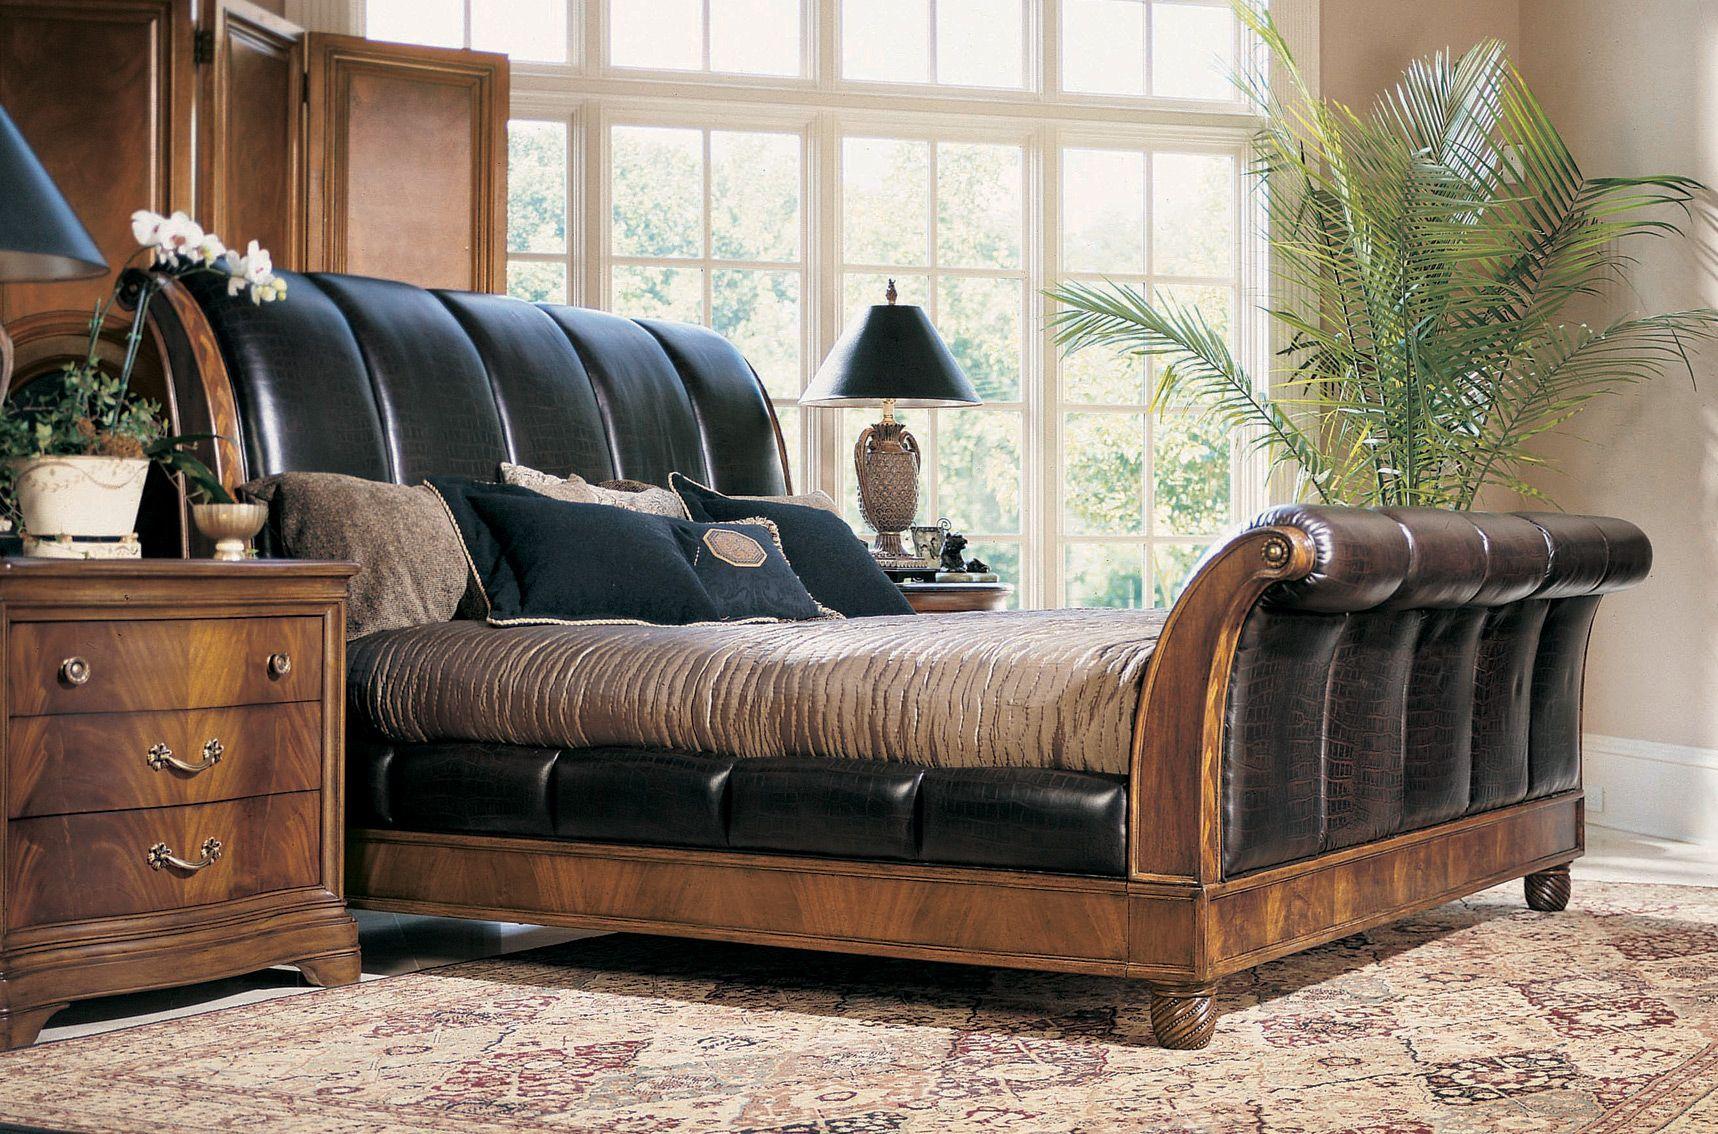 Image result for bob mackie sleigh bed for sale Bedroom